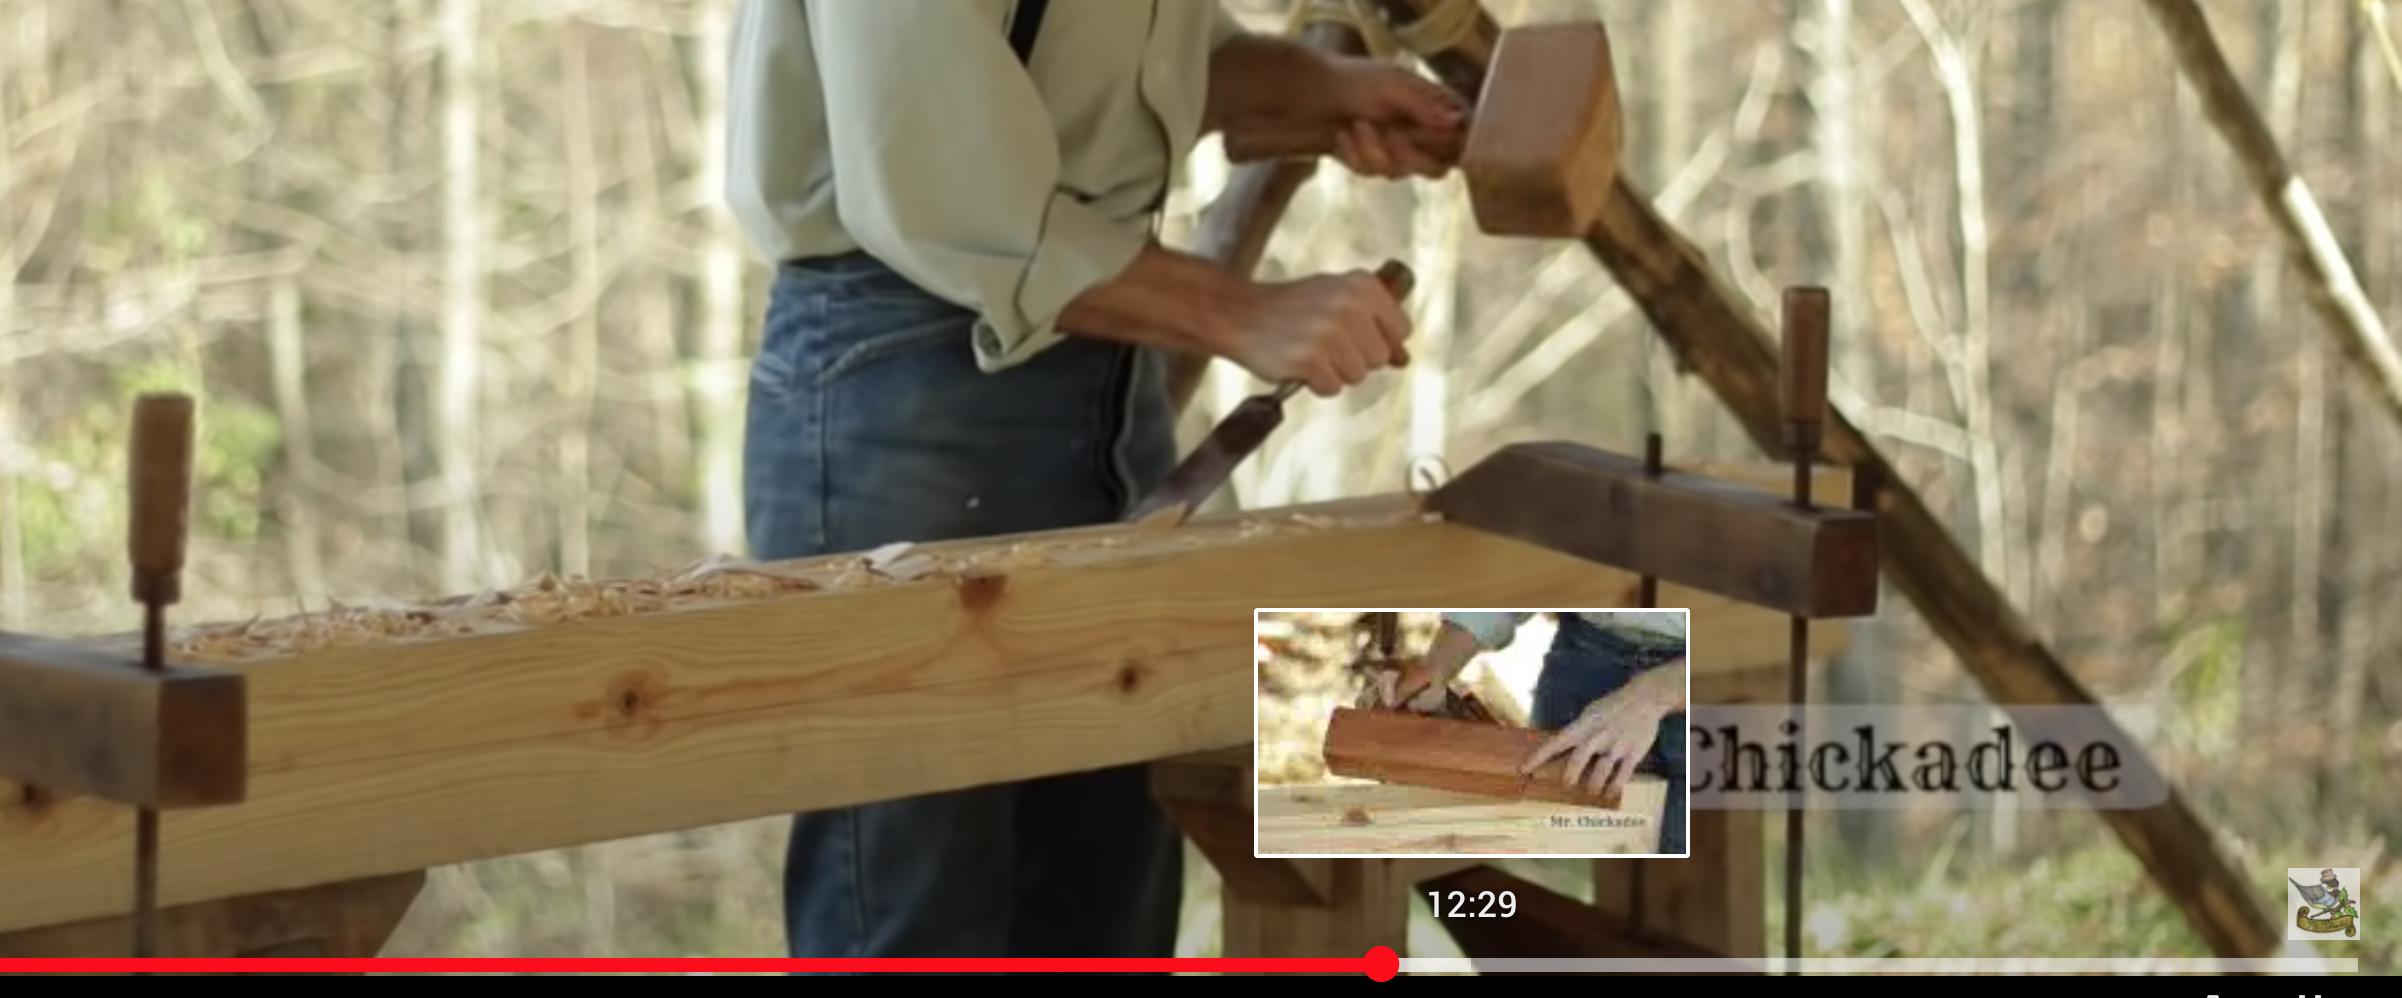 ASMR : les mains au travail